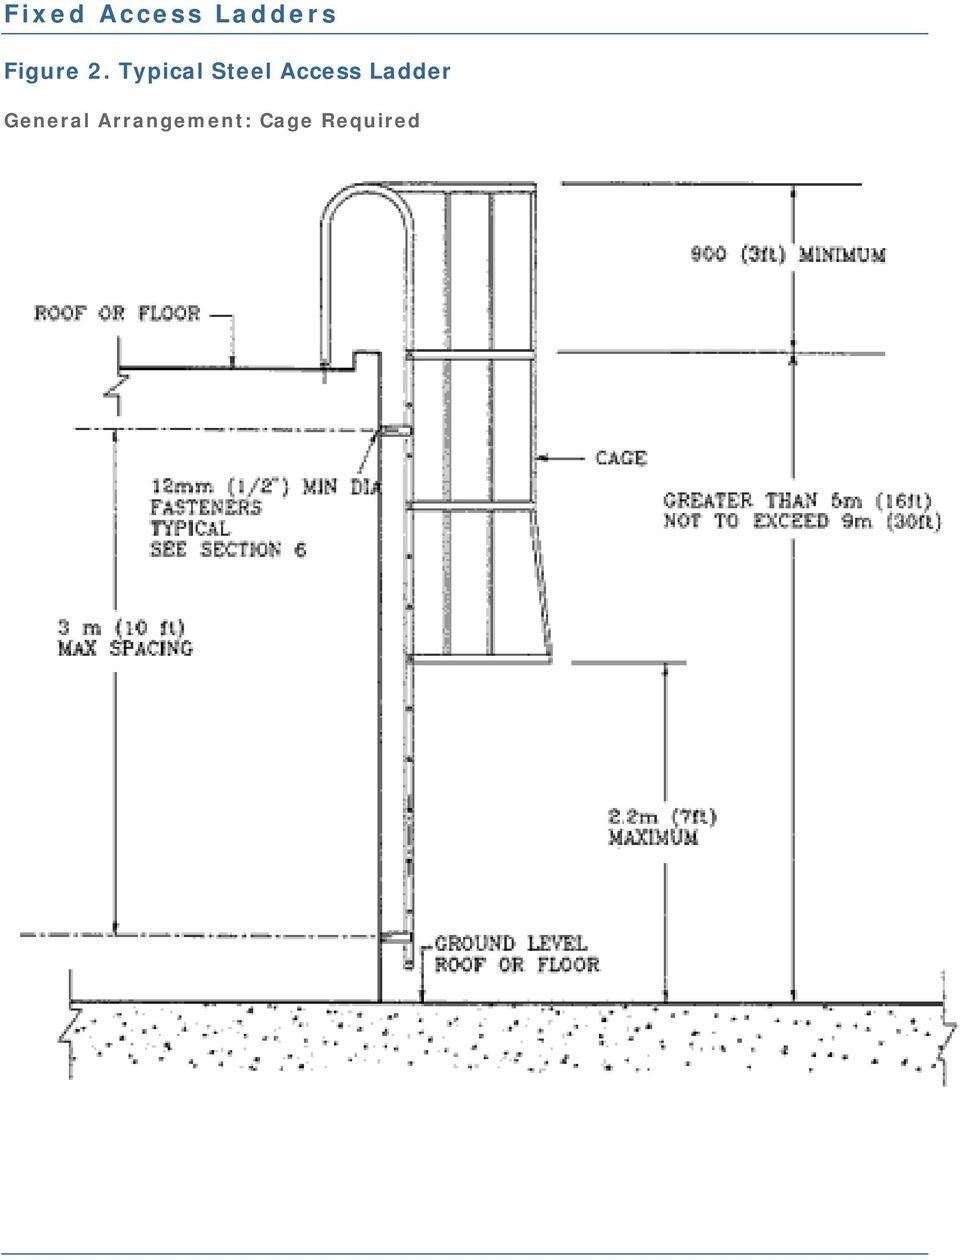 Osha Fixed Ladder Inspection Form